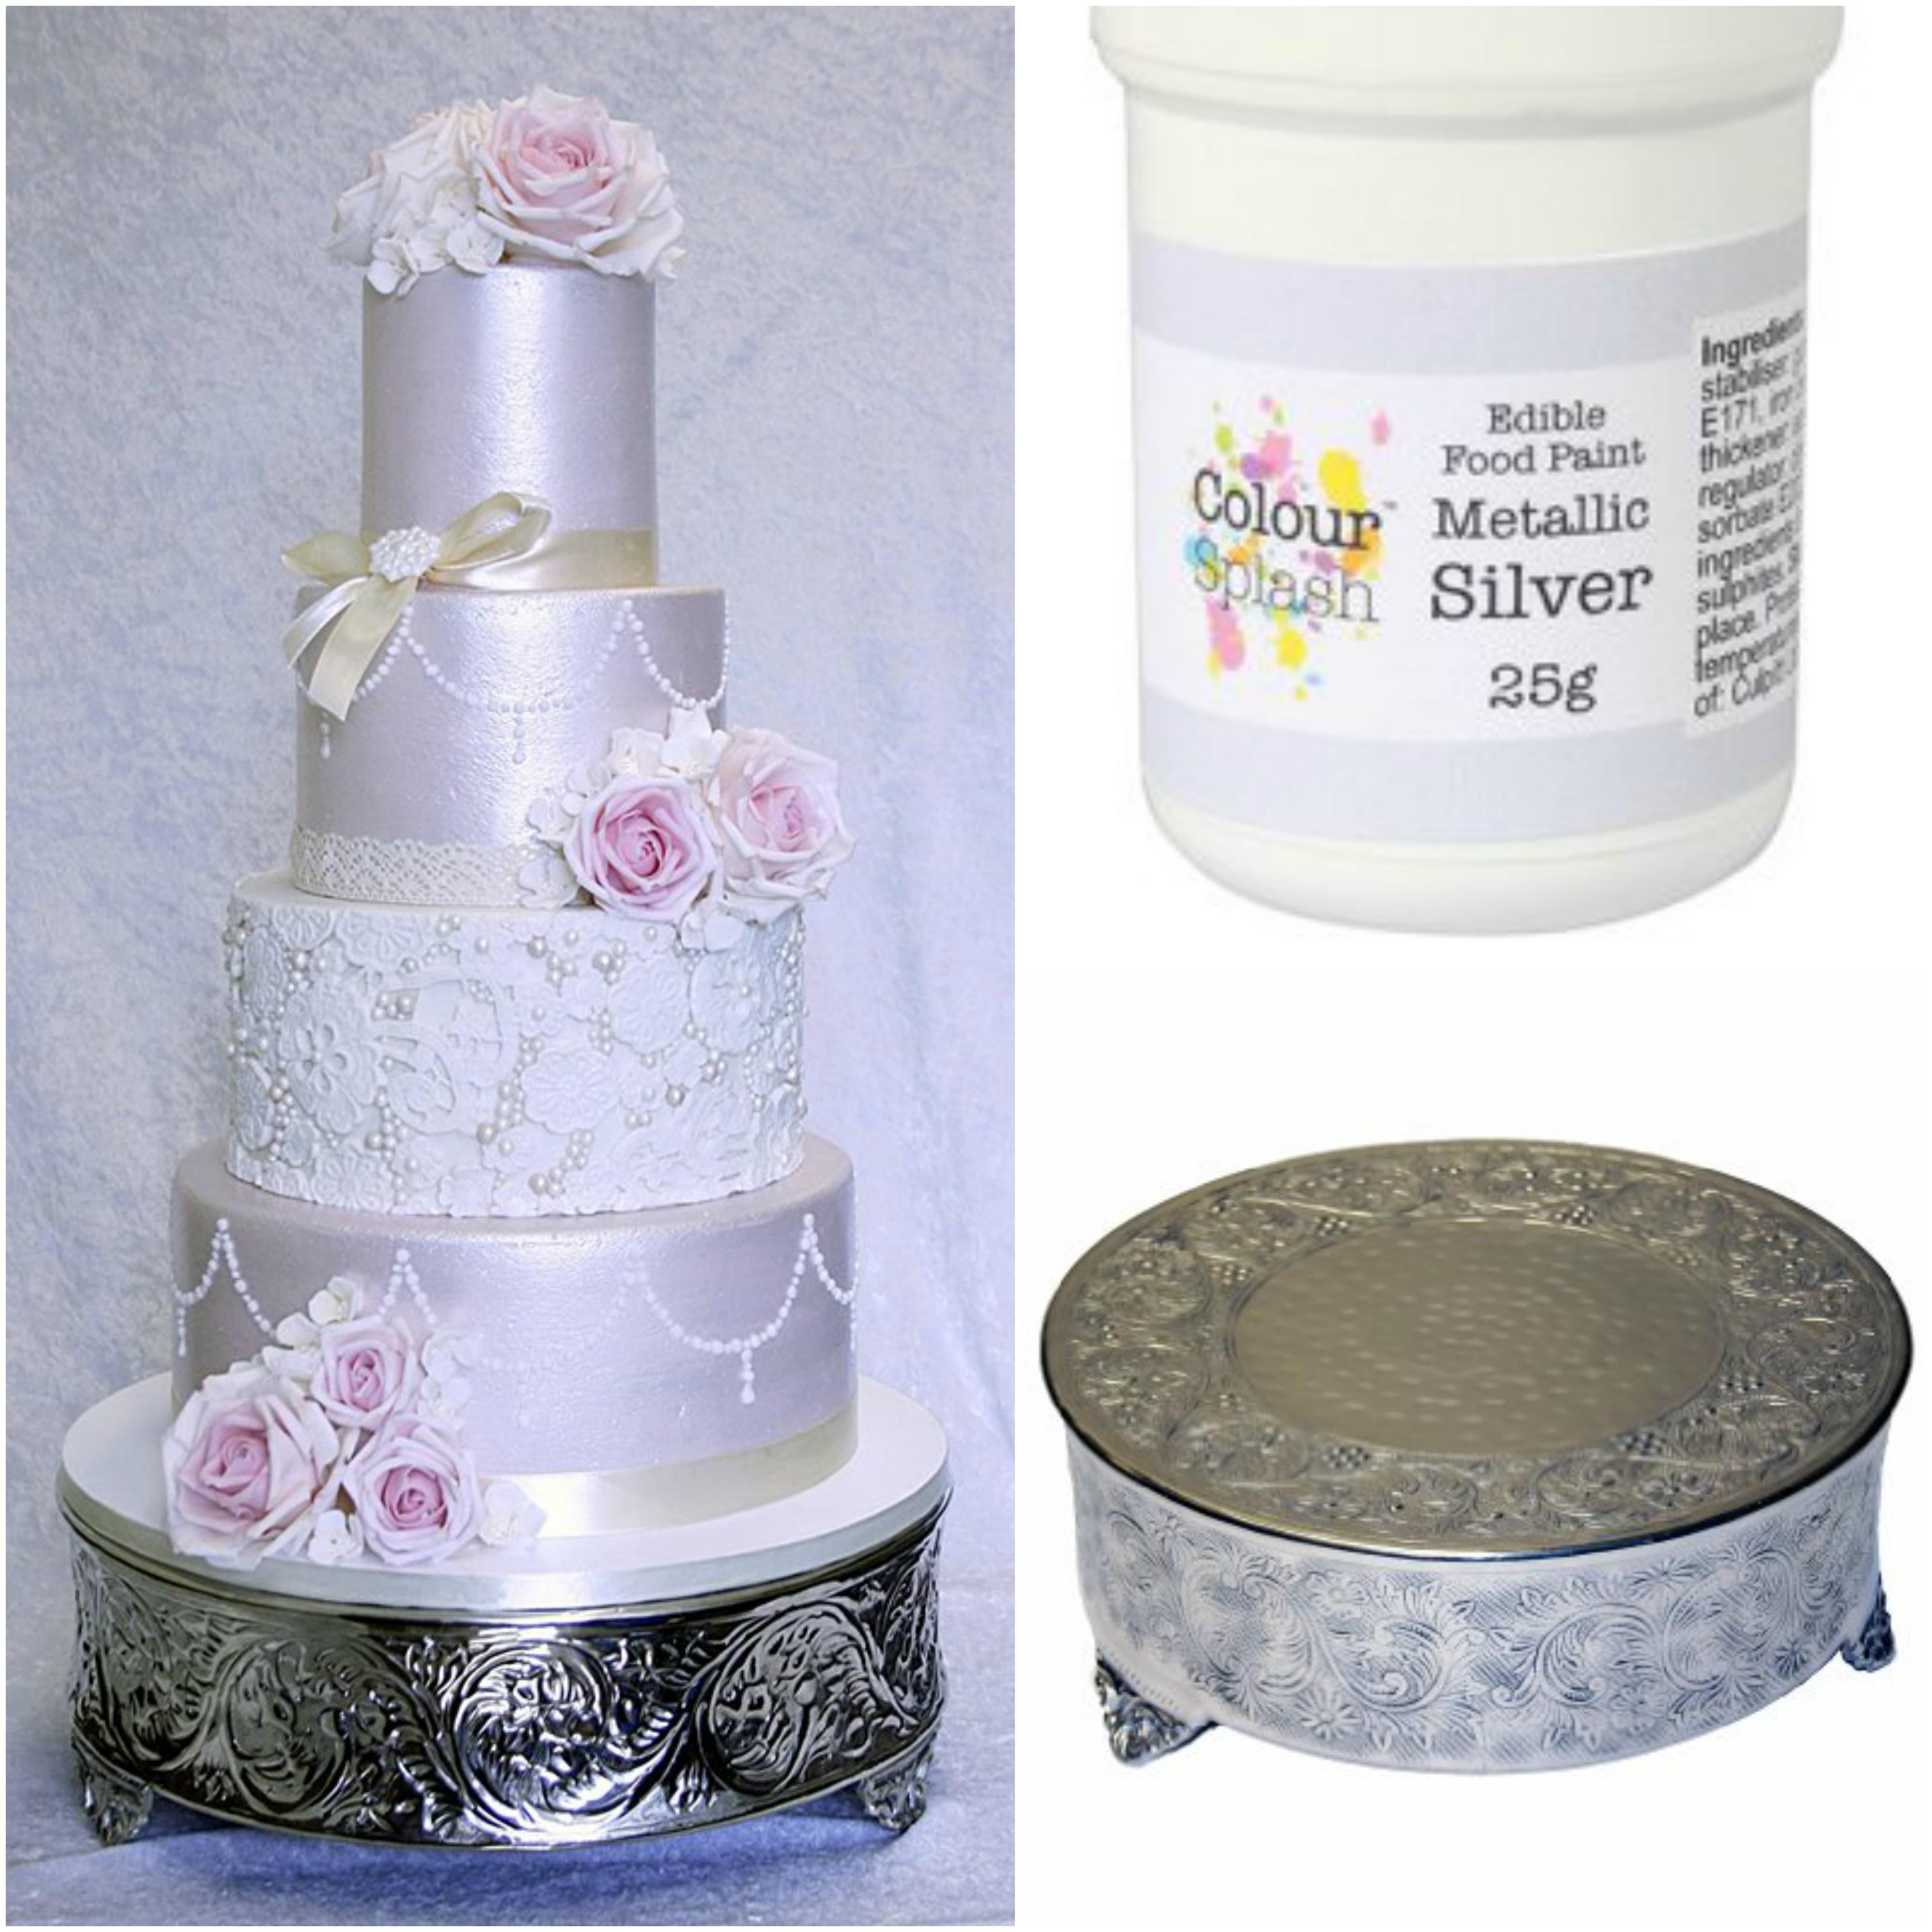 Colour Splash Edible Paint Metallic Silver 25g Uganda Trimmings Ltd